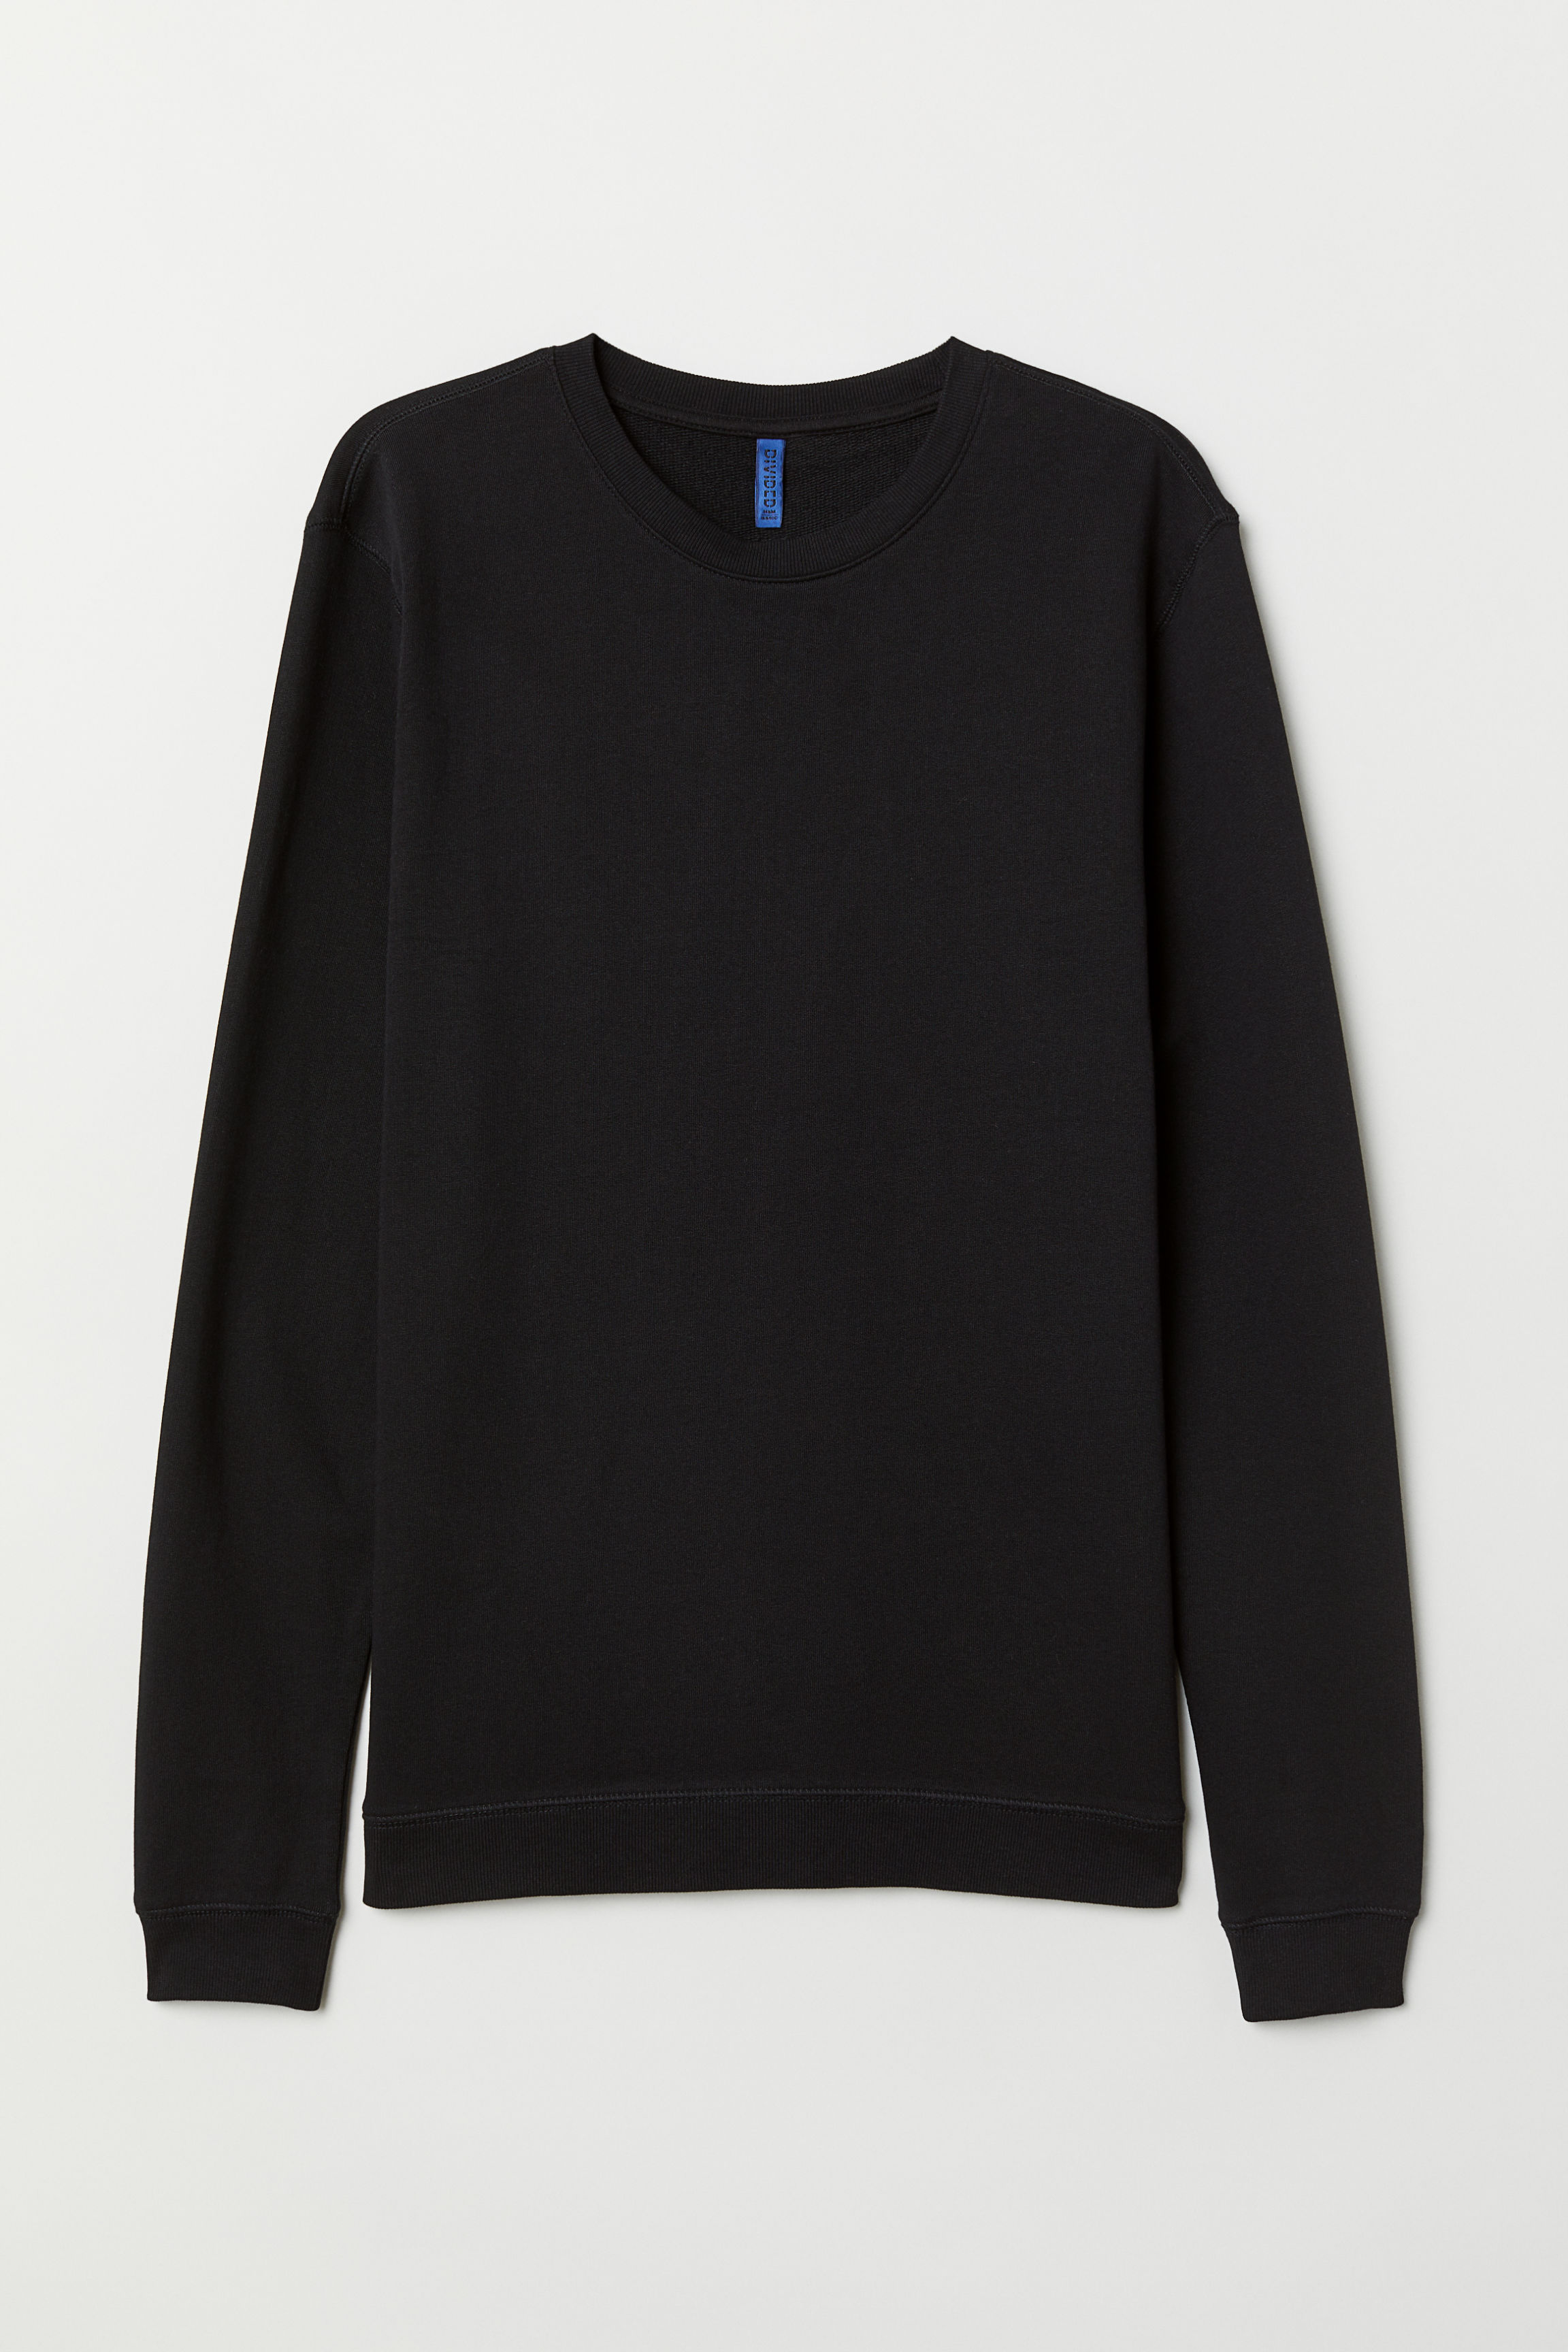 597059b6 Muscle Fit Sweatshirt - Black - Men | H&M US